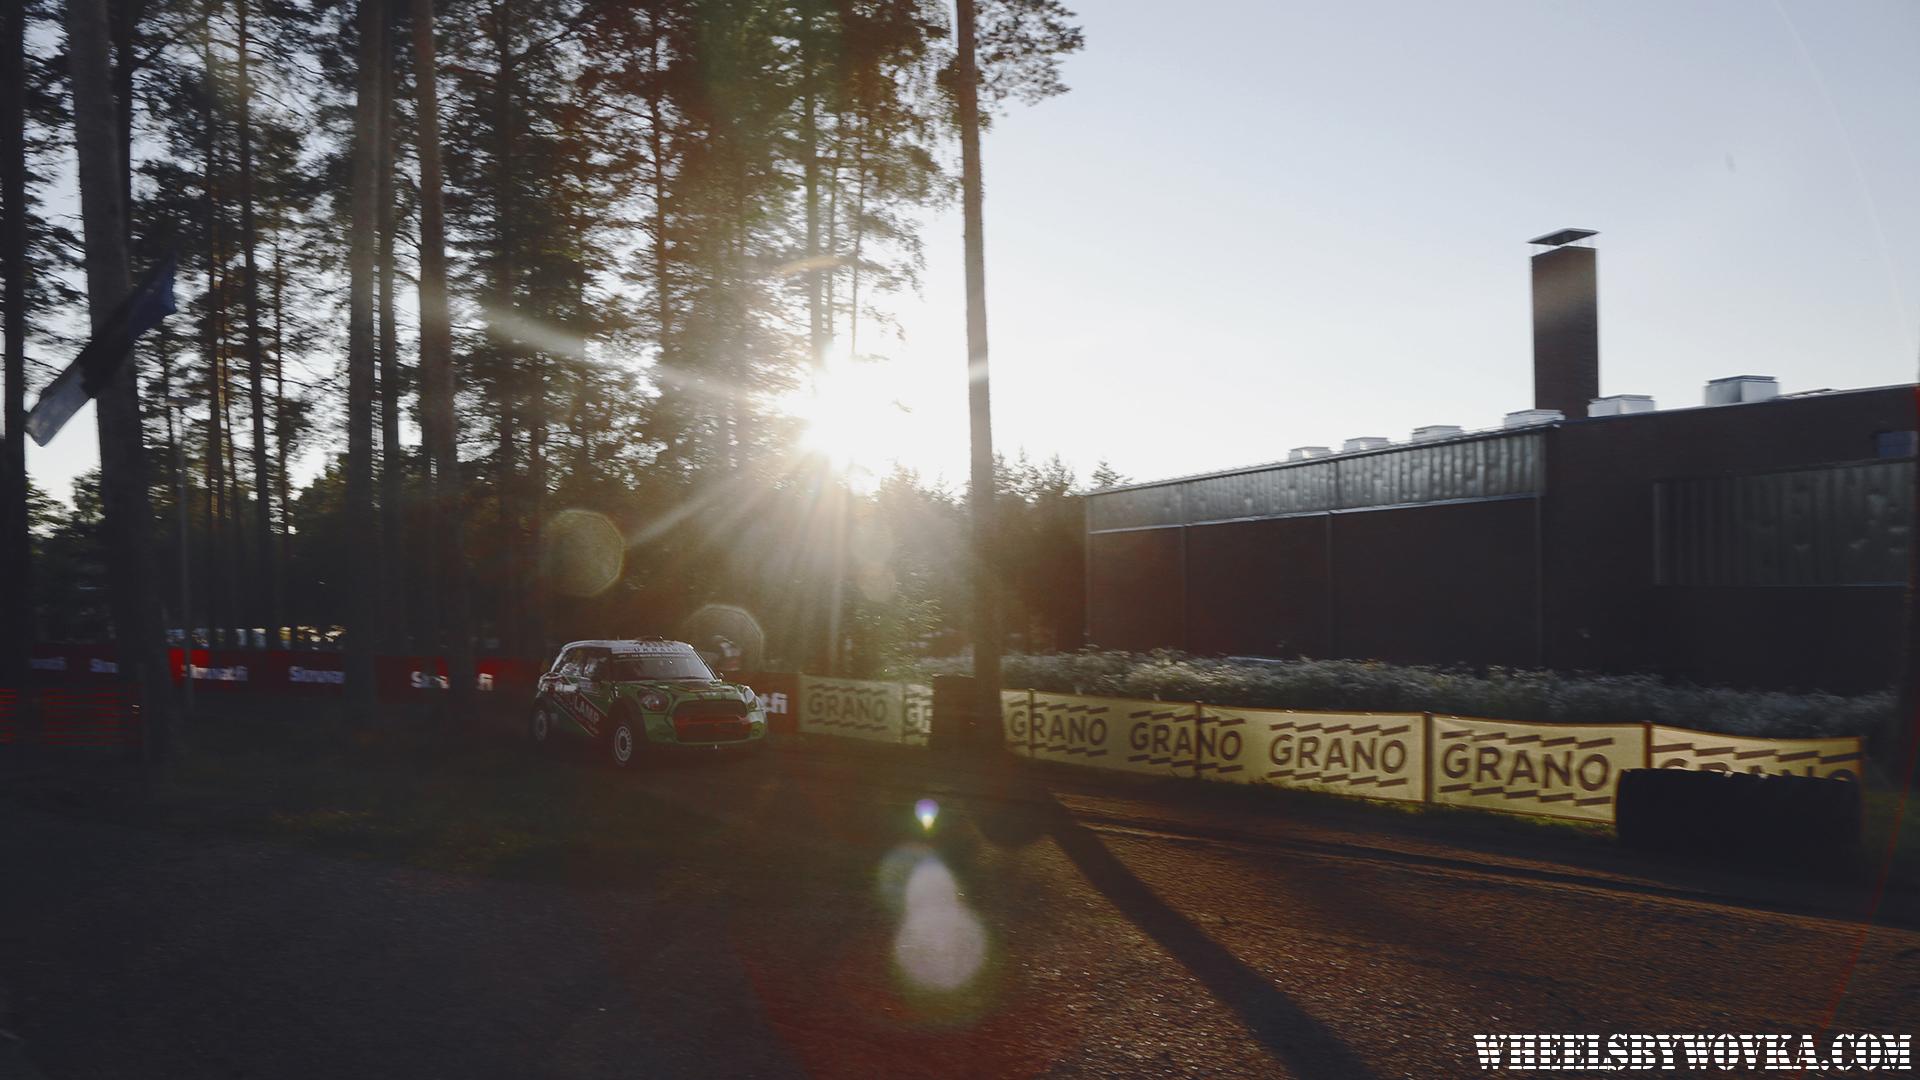 wrc-neste-rally-finalnd-2017-by-wheelsbywovka-3